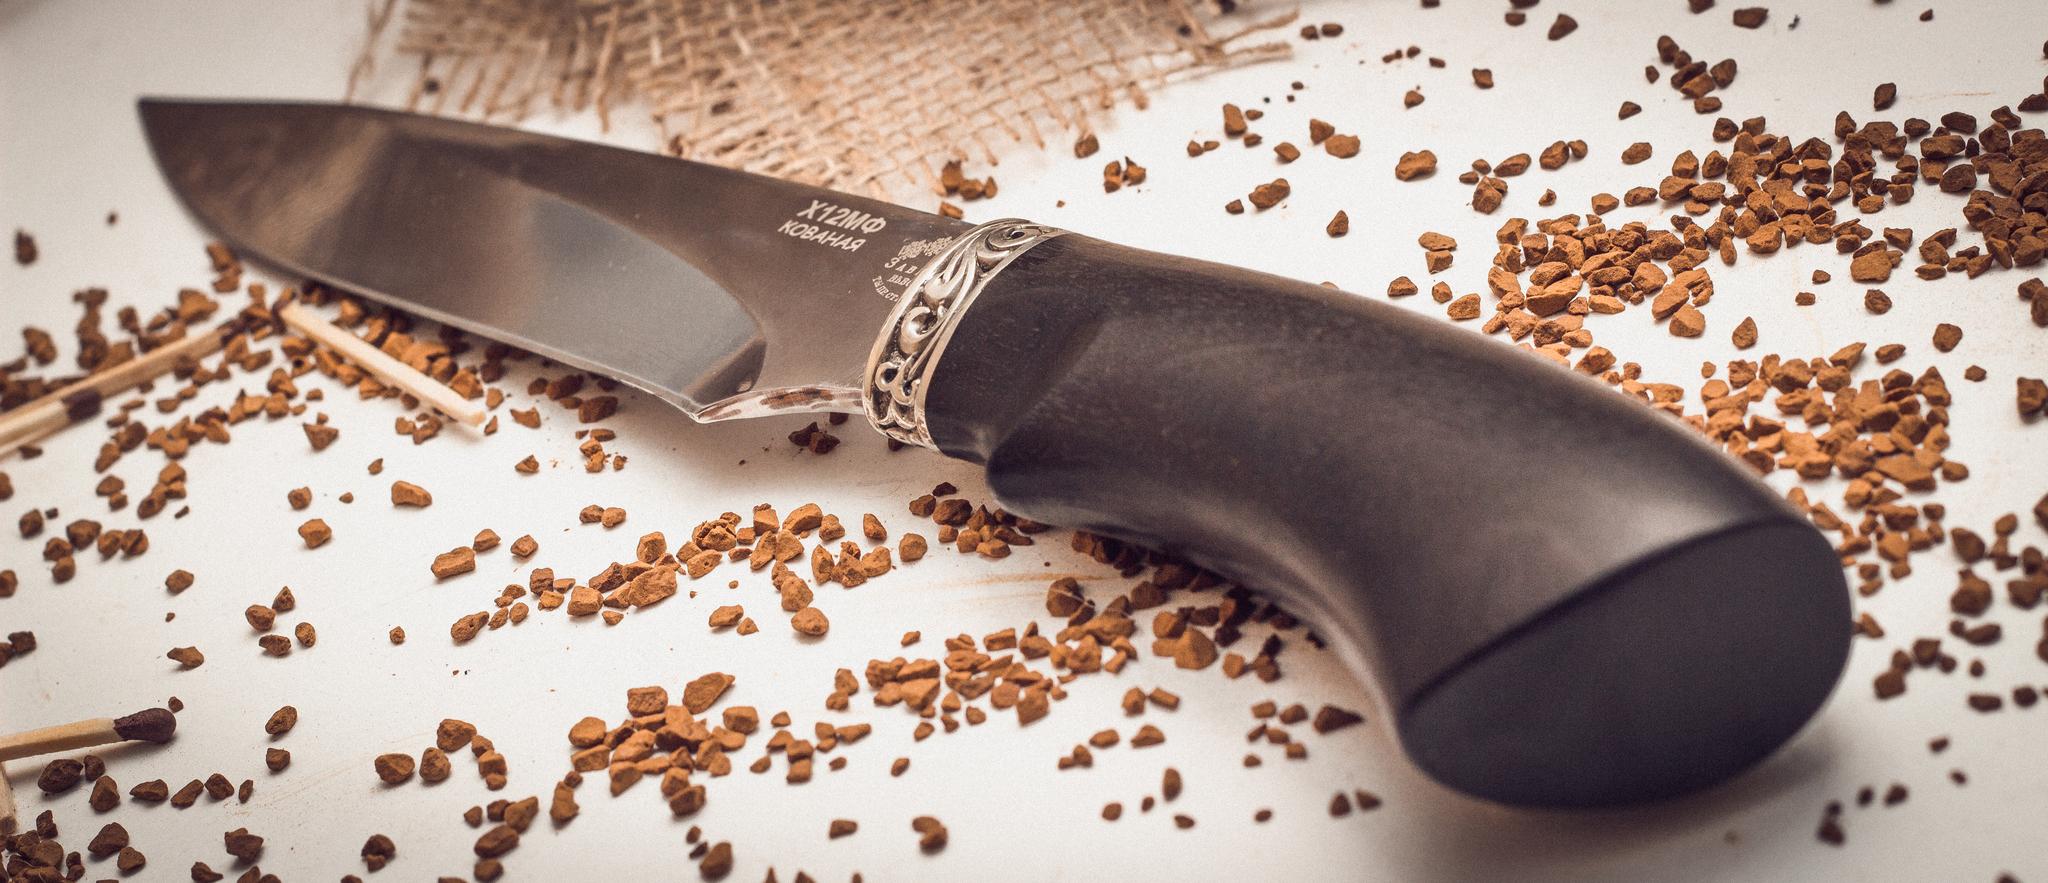 Нож Акула, кованый Х12МФ,  черный граб